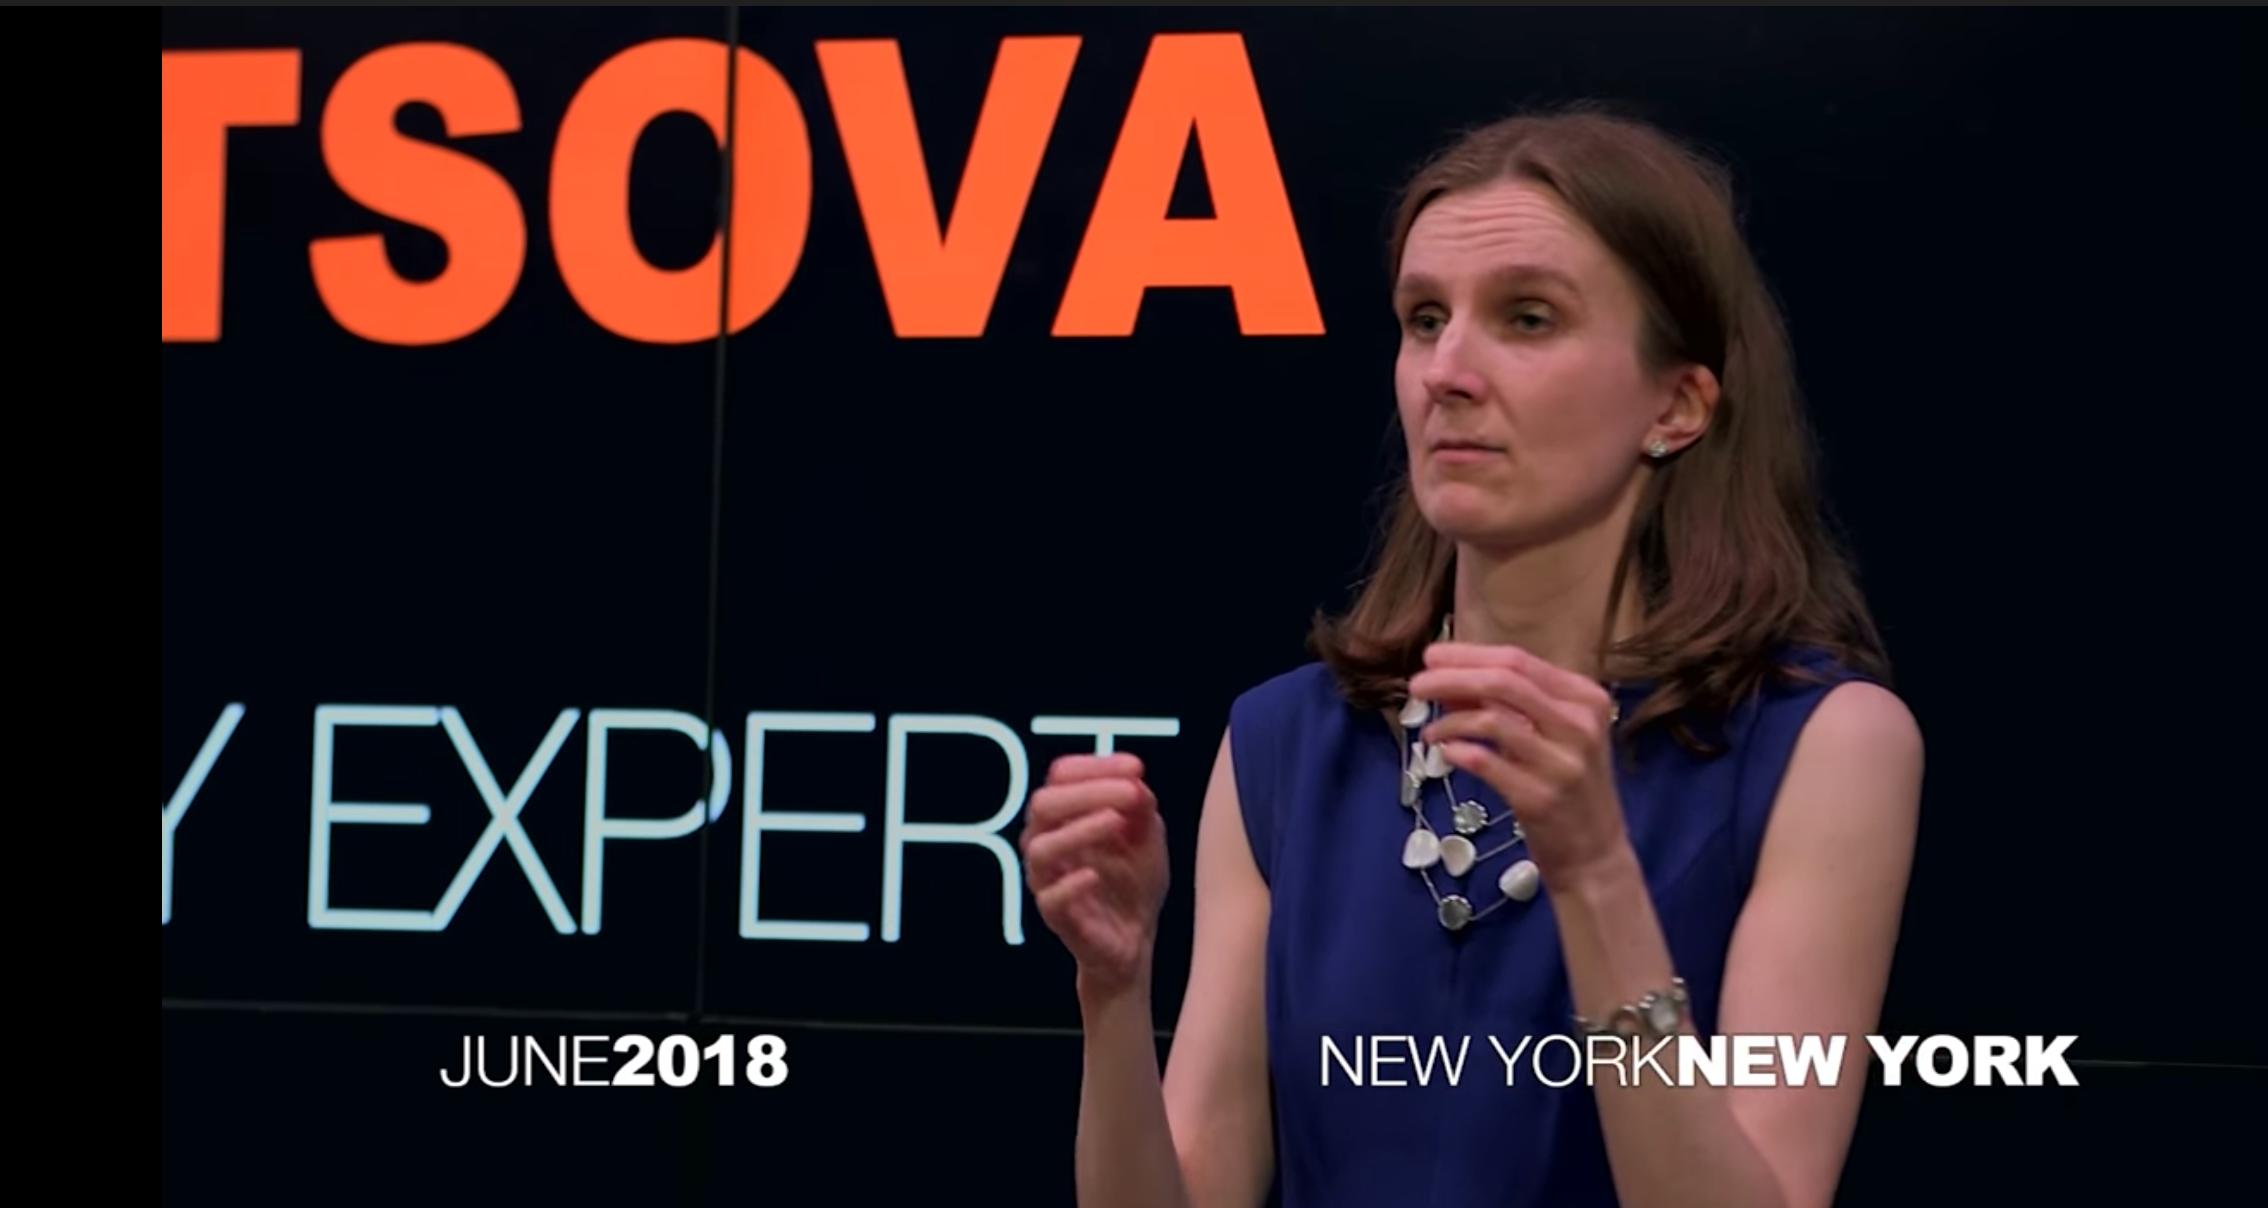 Svetlana using sign language at her Ted Talk